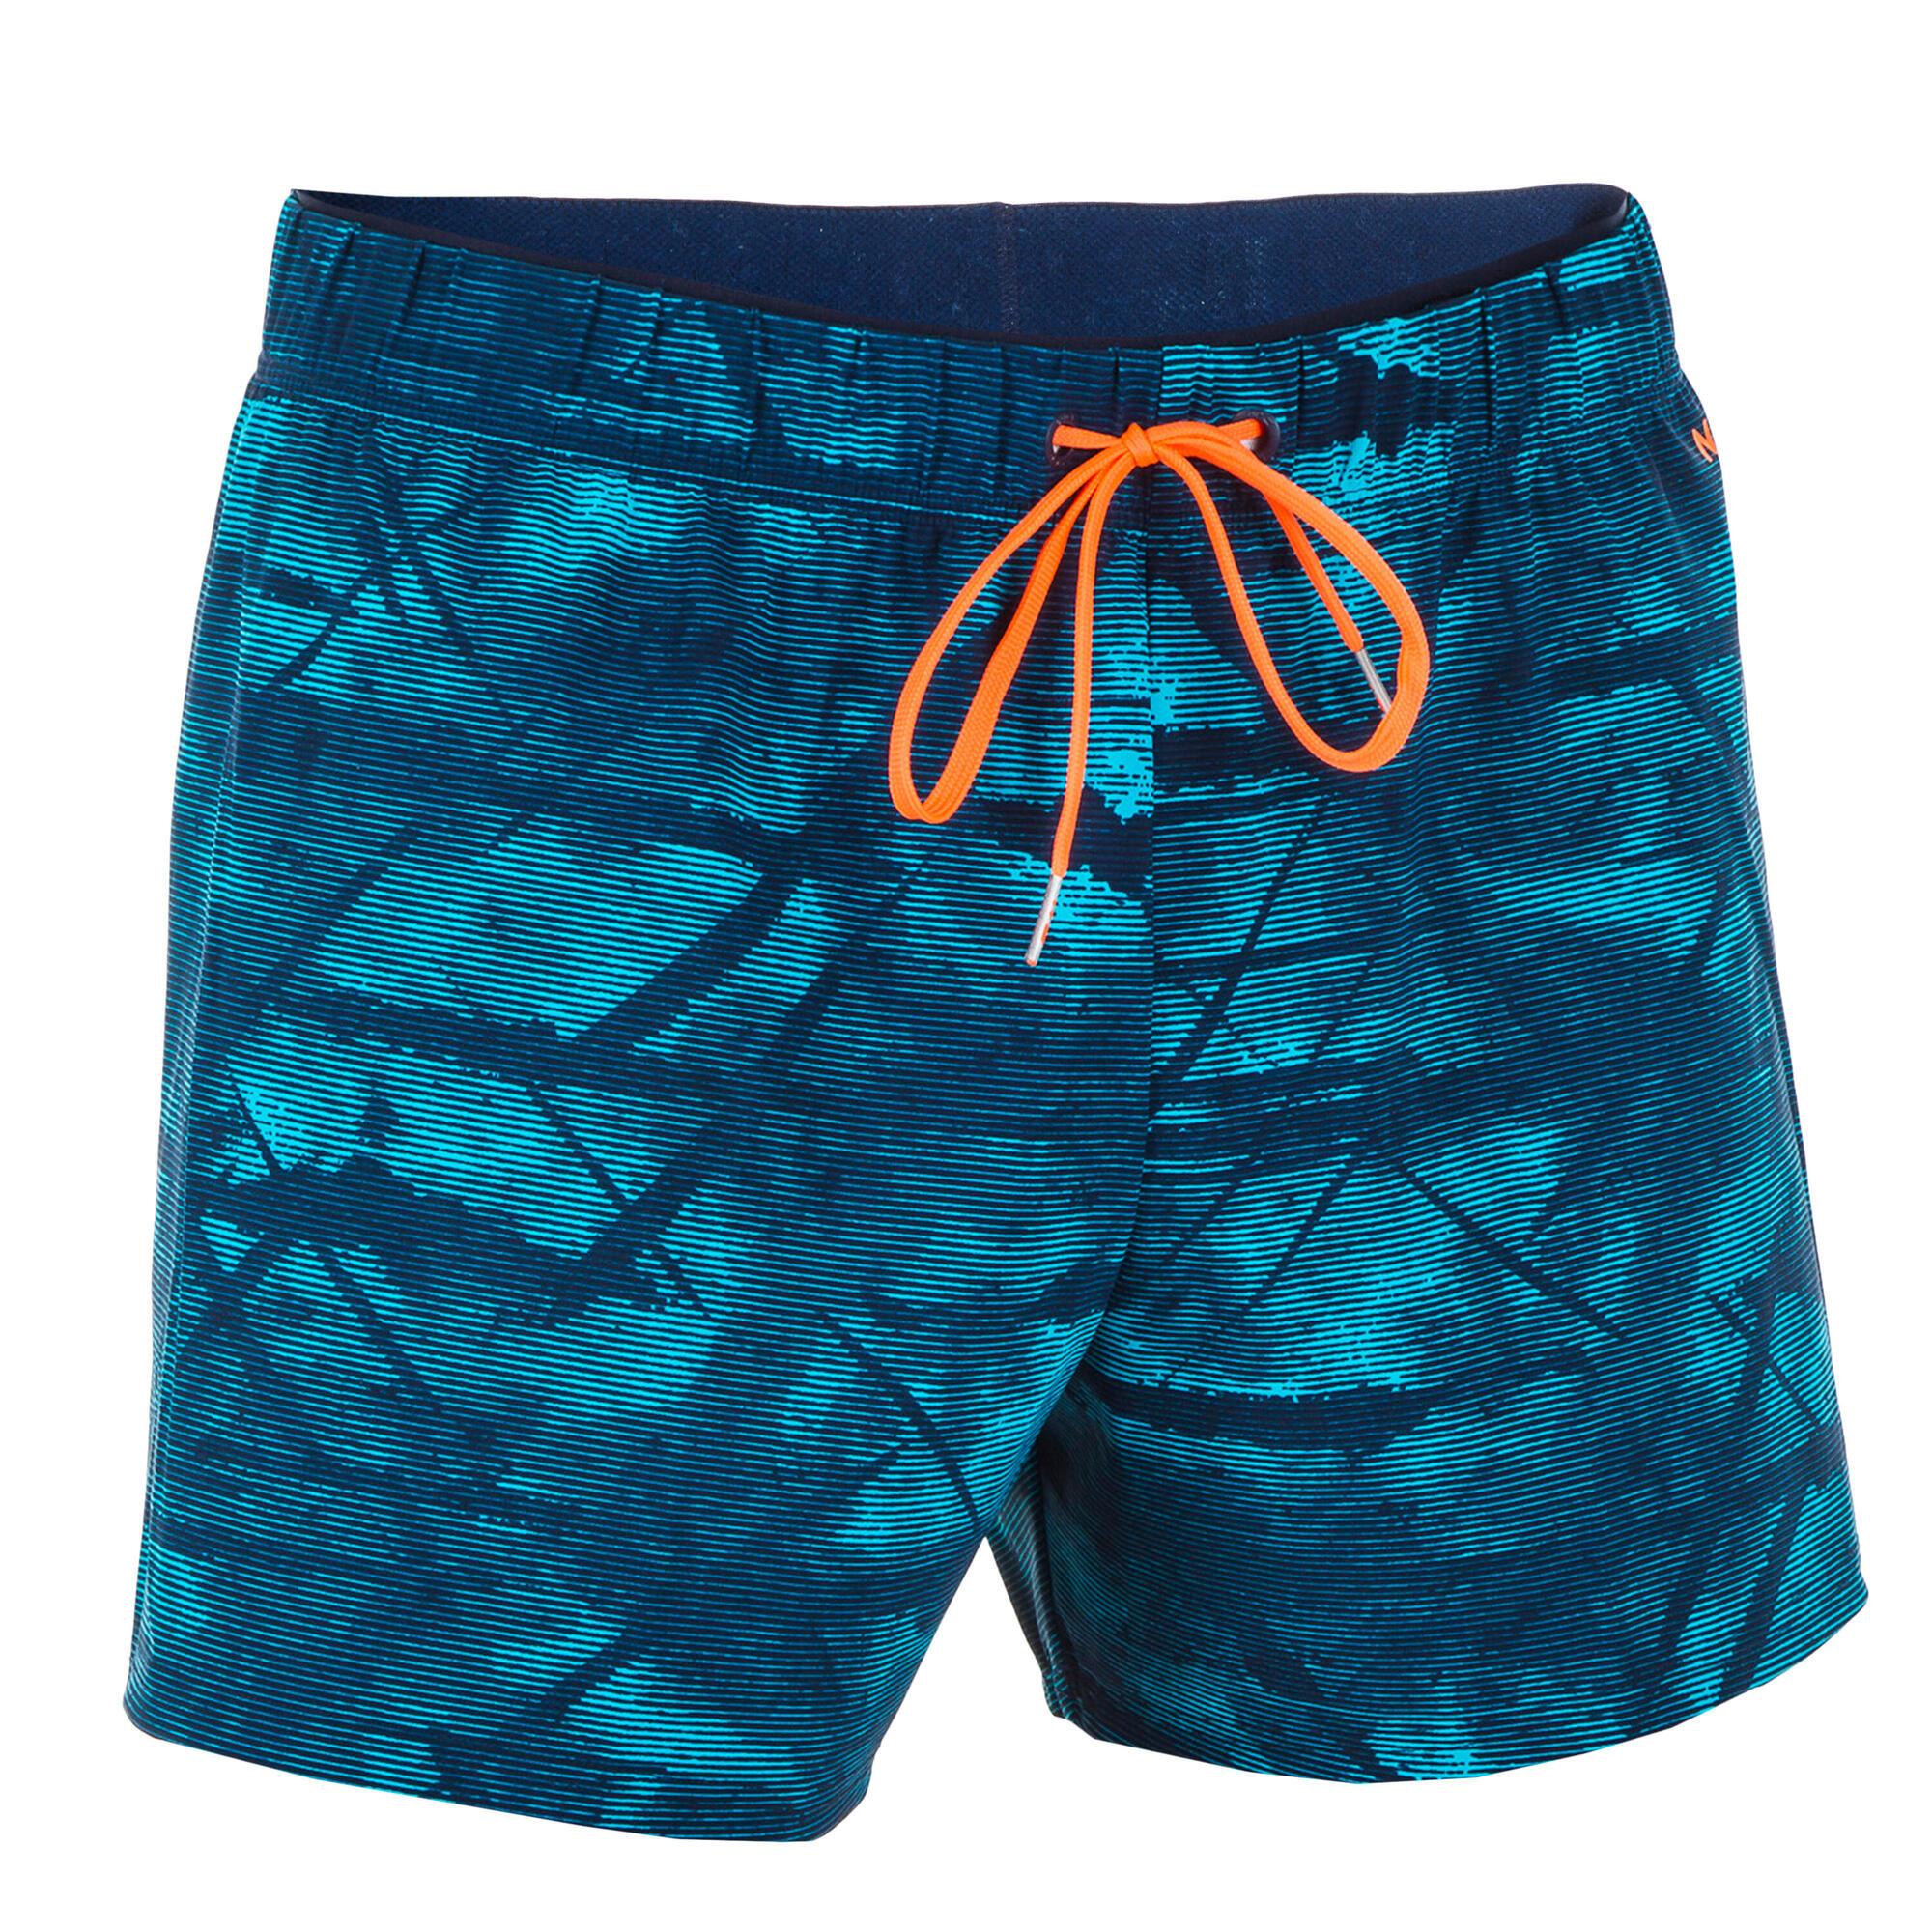 Men's Swimming Short Swim Shorts 100 - Tex Blue | Nabaiji